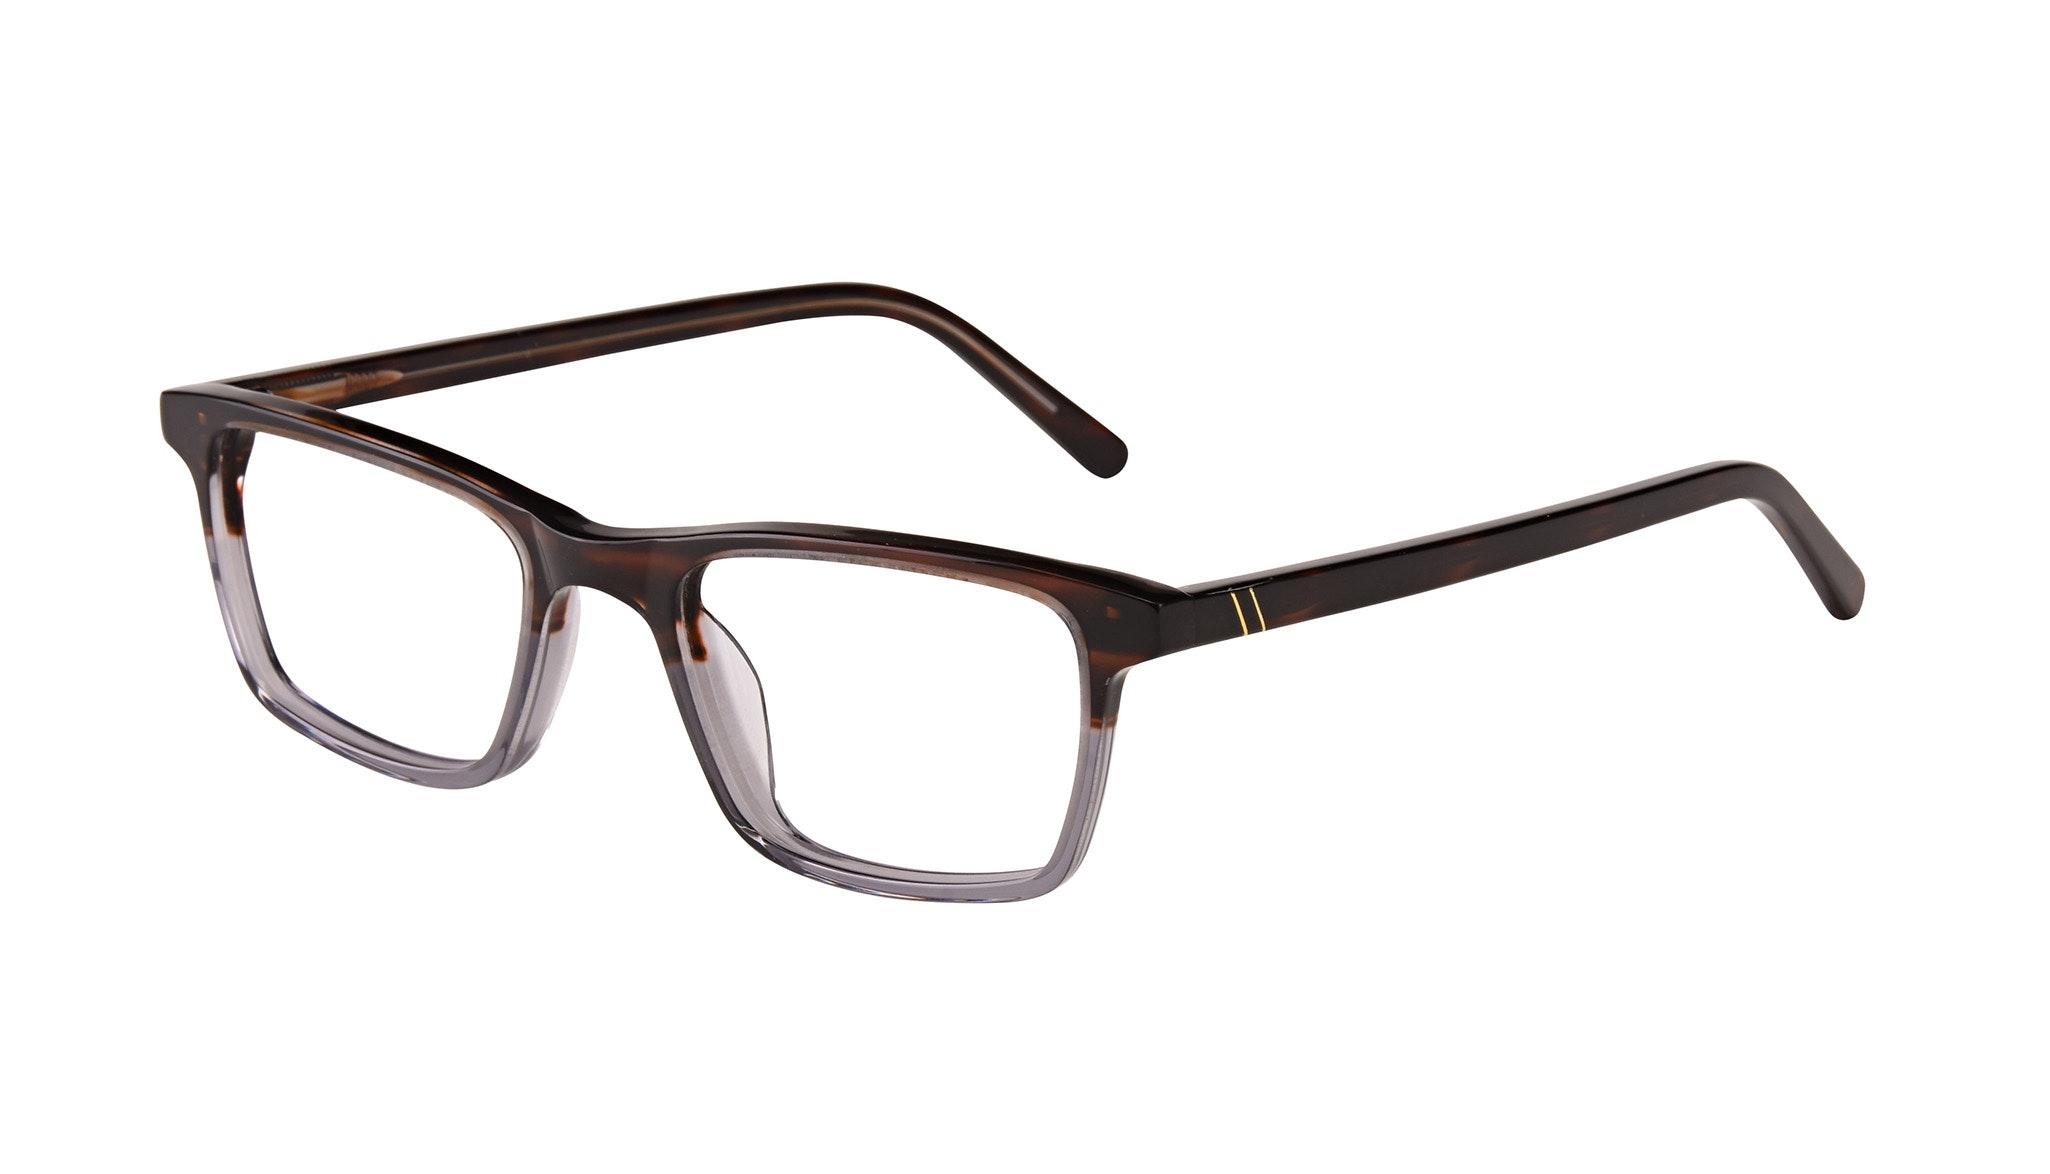 Affordable Fashion Glasses Rectangle Eyeglasses Men Henri SML Storm Tilt